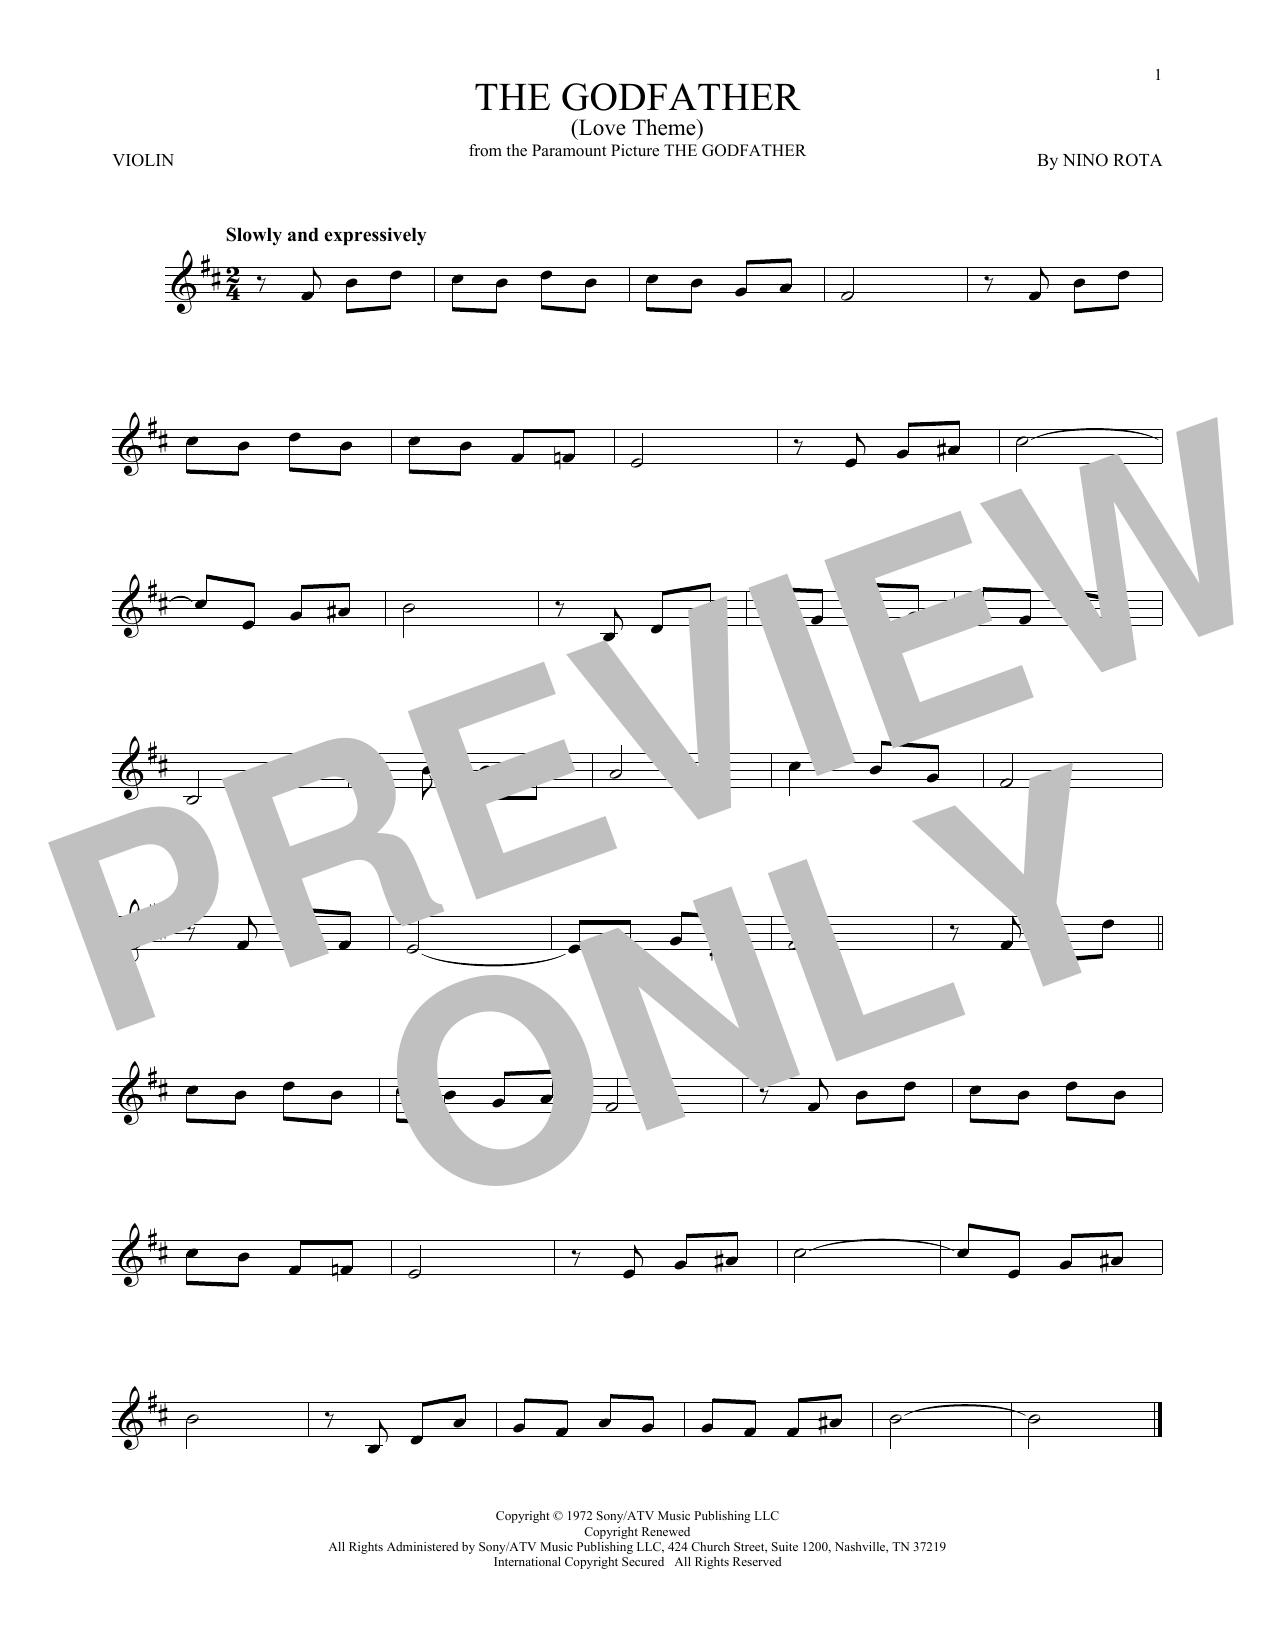 The Godfather (Love Theme) (Violin Solo)